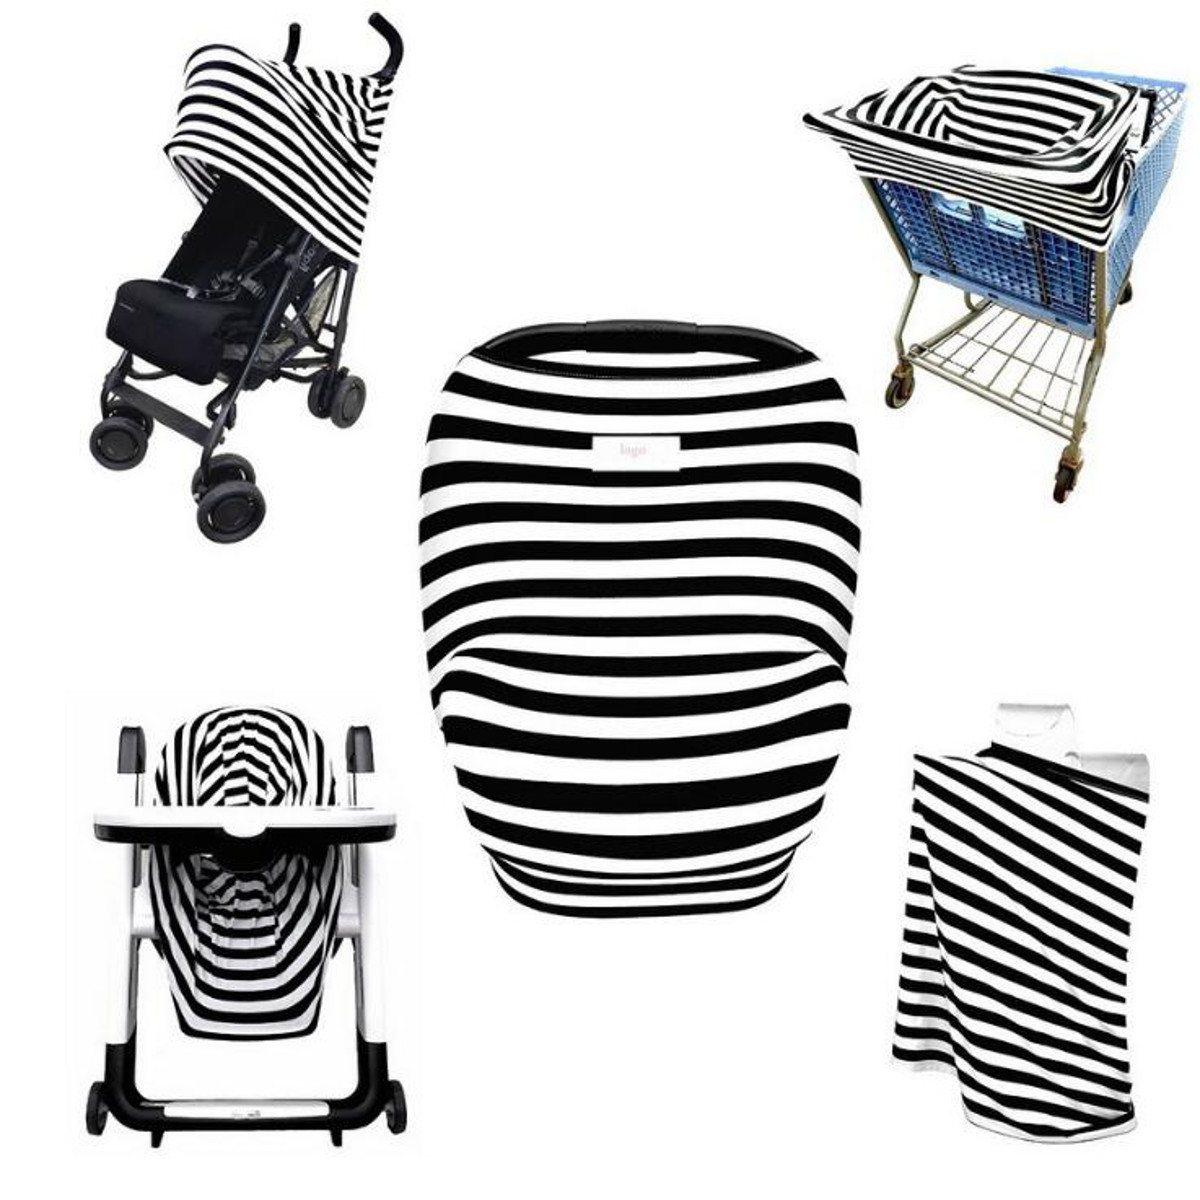 Multifunctional Stretchy Car Seat Canopy nursing cover stroller anti-sun sunshade cloth Sh